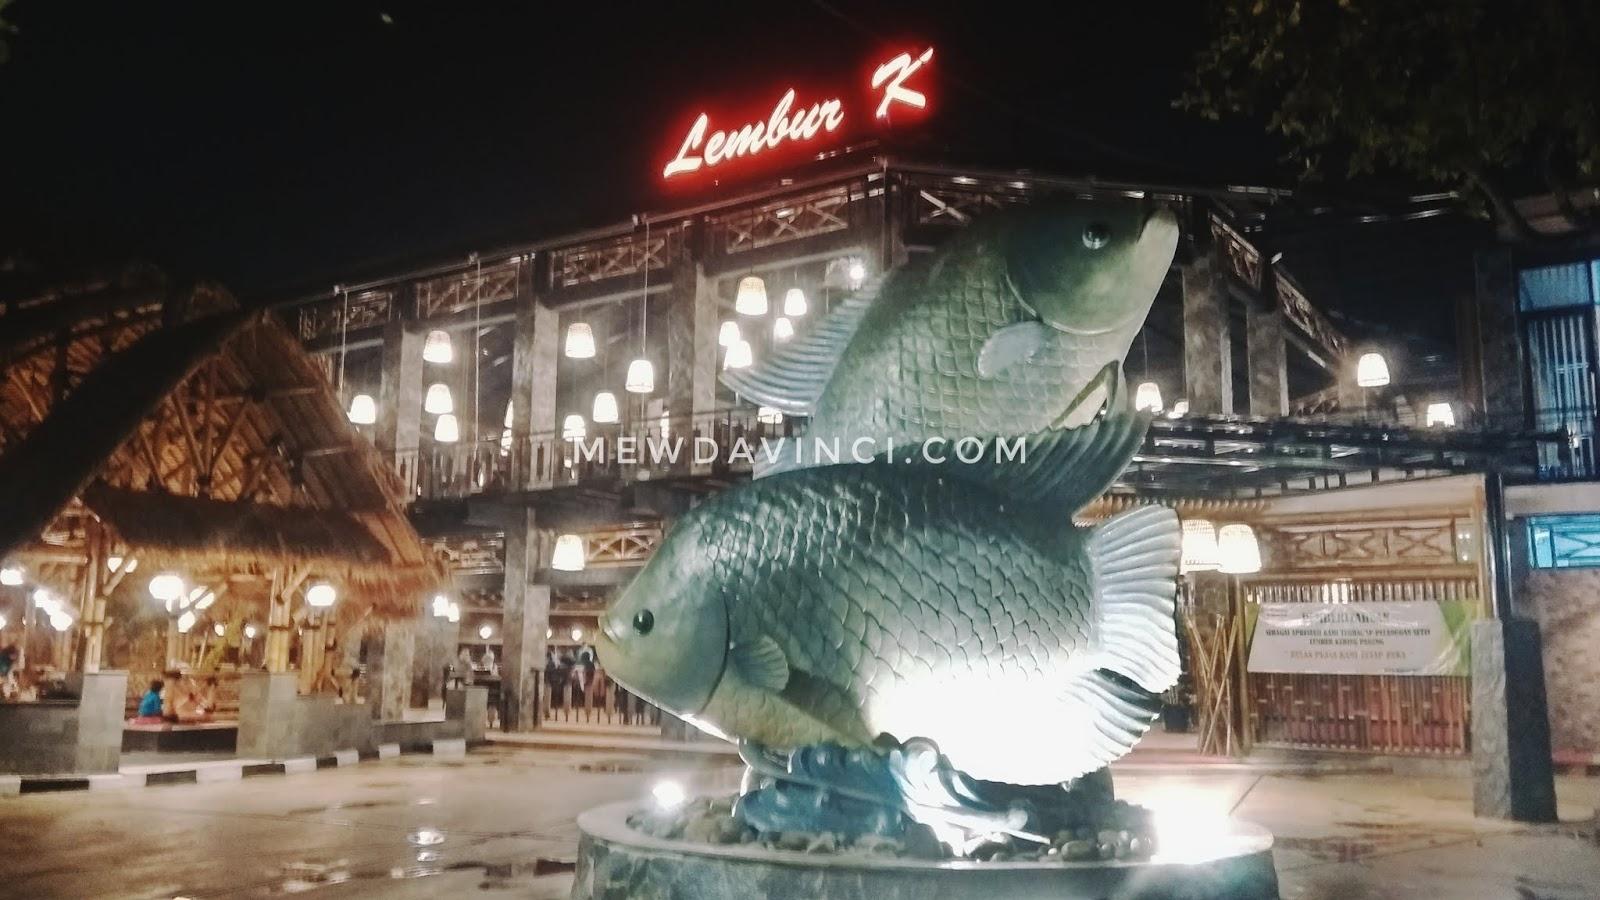 Tampilan depan restoran sunda Lembur Kuring Seafood Parung